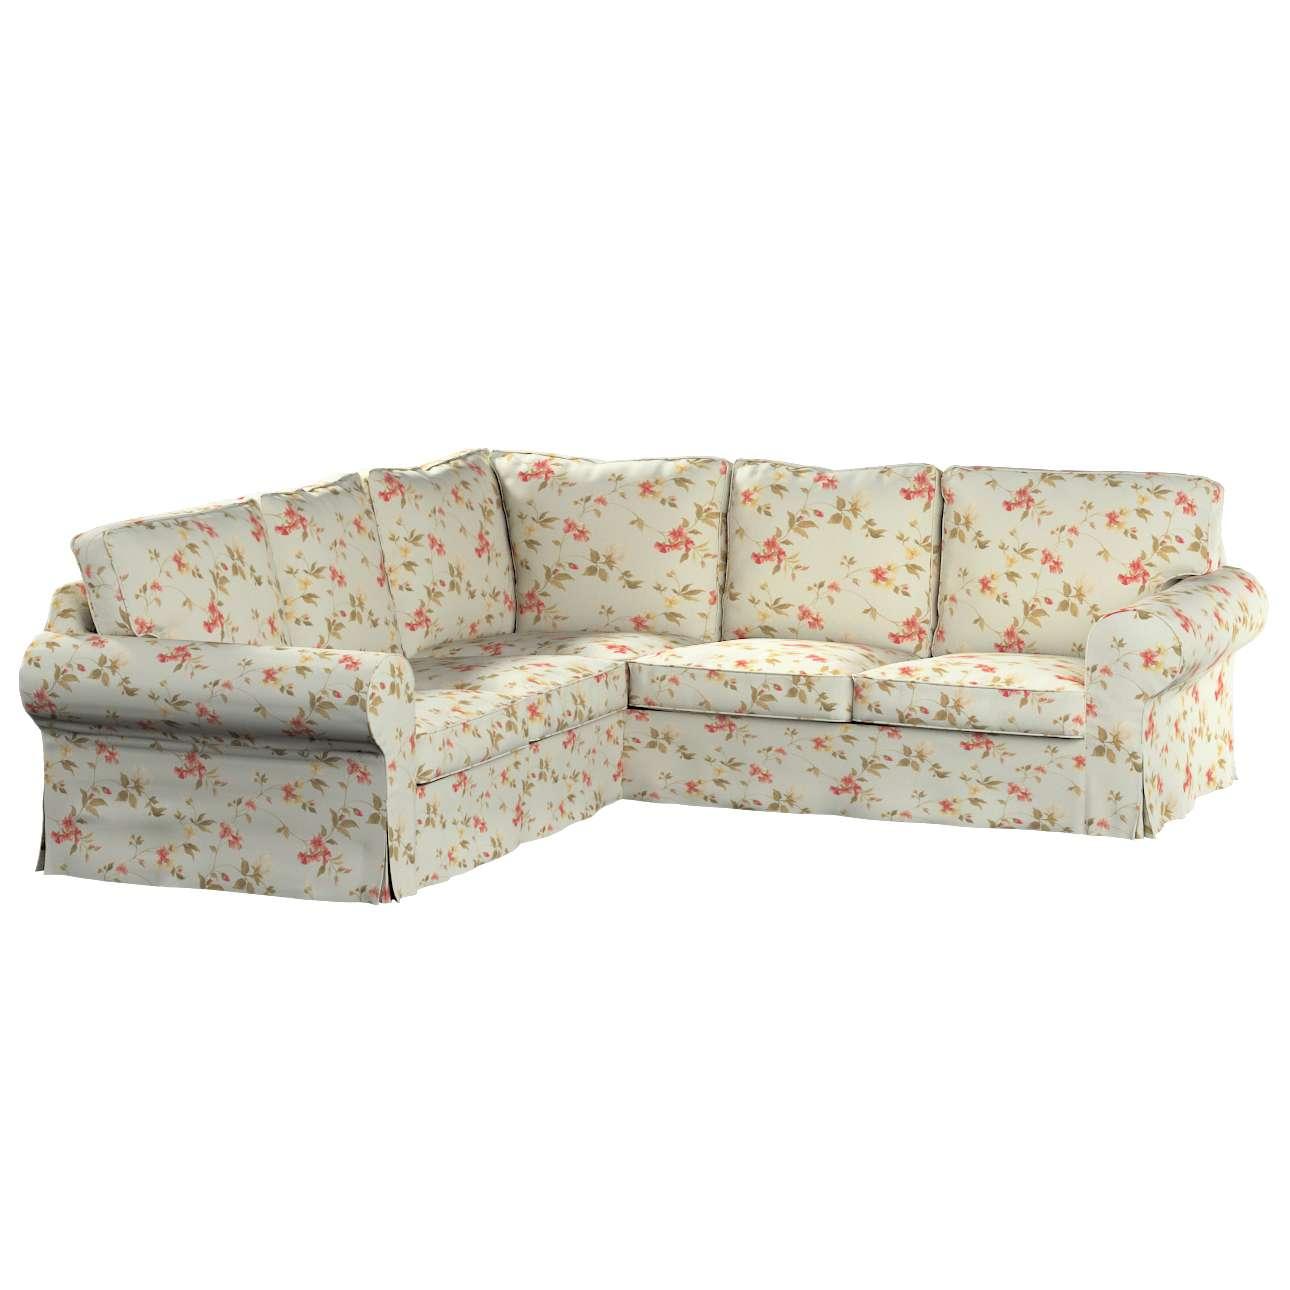 Ektorp kampinė sofa Ektorp kampinė sofa kolekcijoje Londres, audinys: 124-65